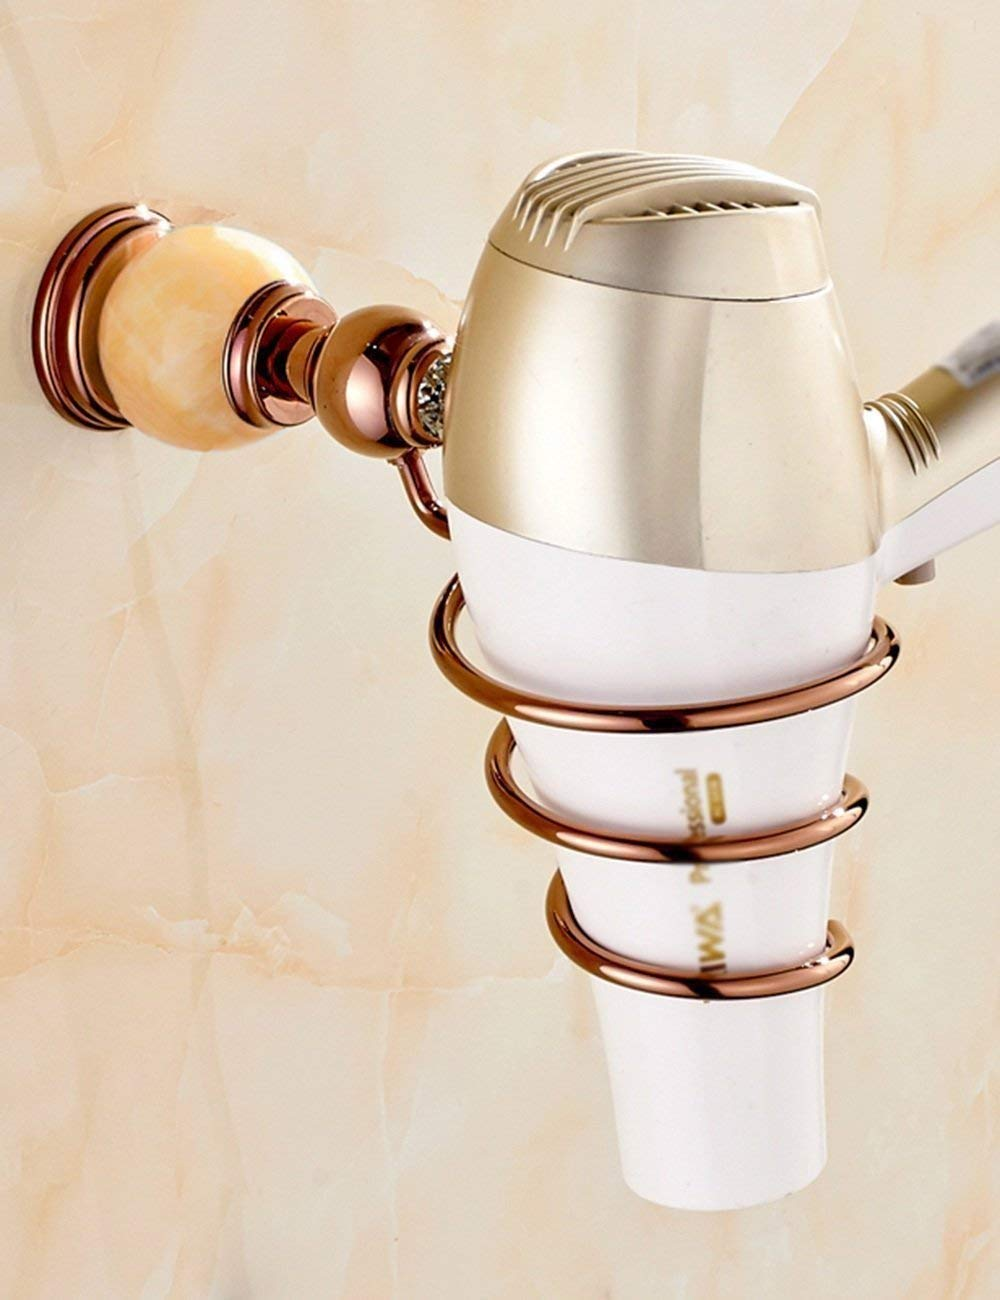 L.I. A European-Style Bathroom Racks of a Hair Dryer Hair Dryer Rack Copper Gold (Color 3, Size: (a)